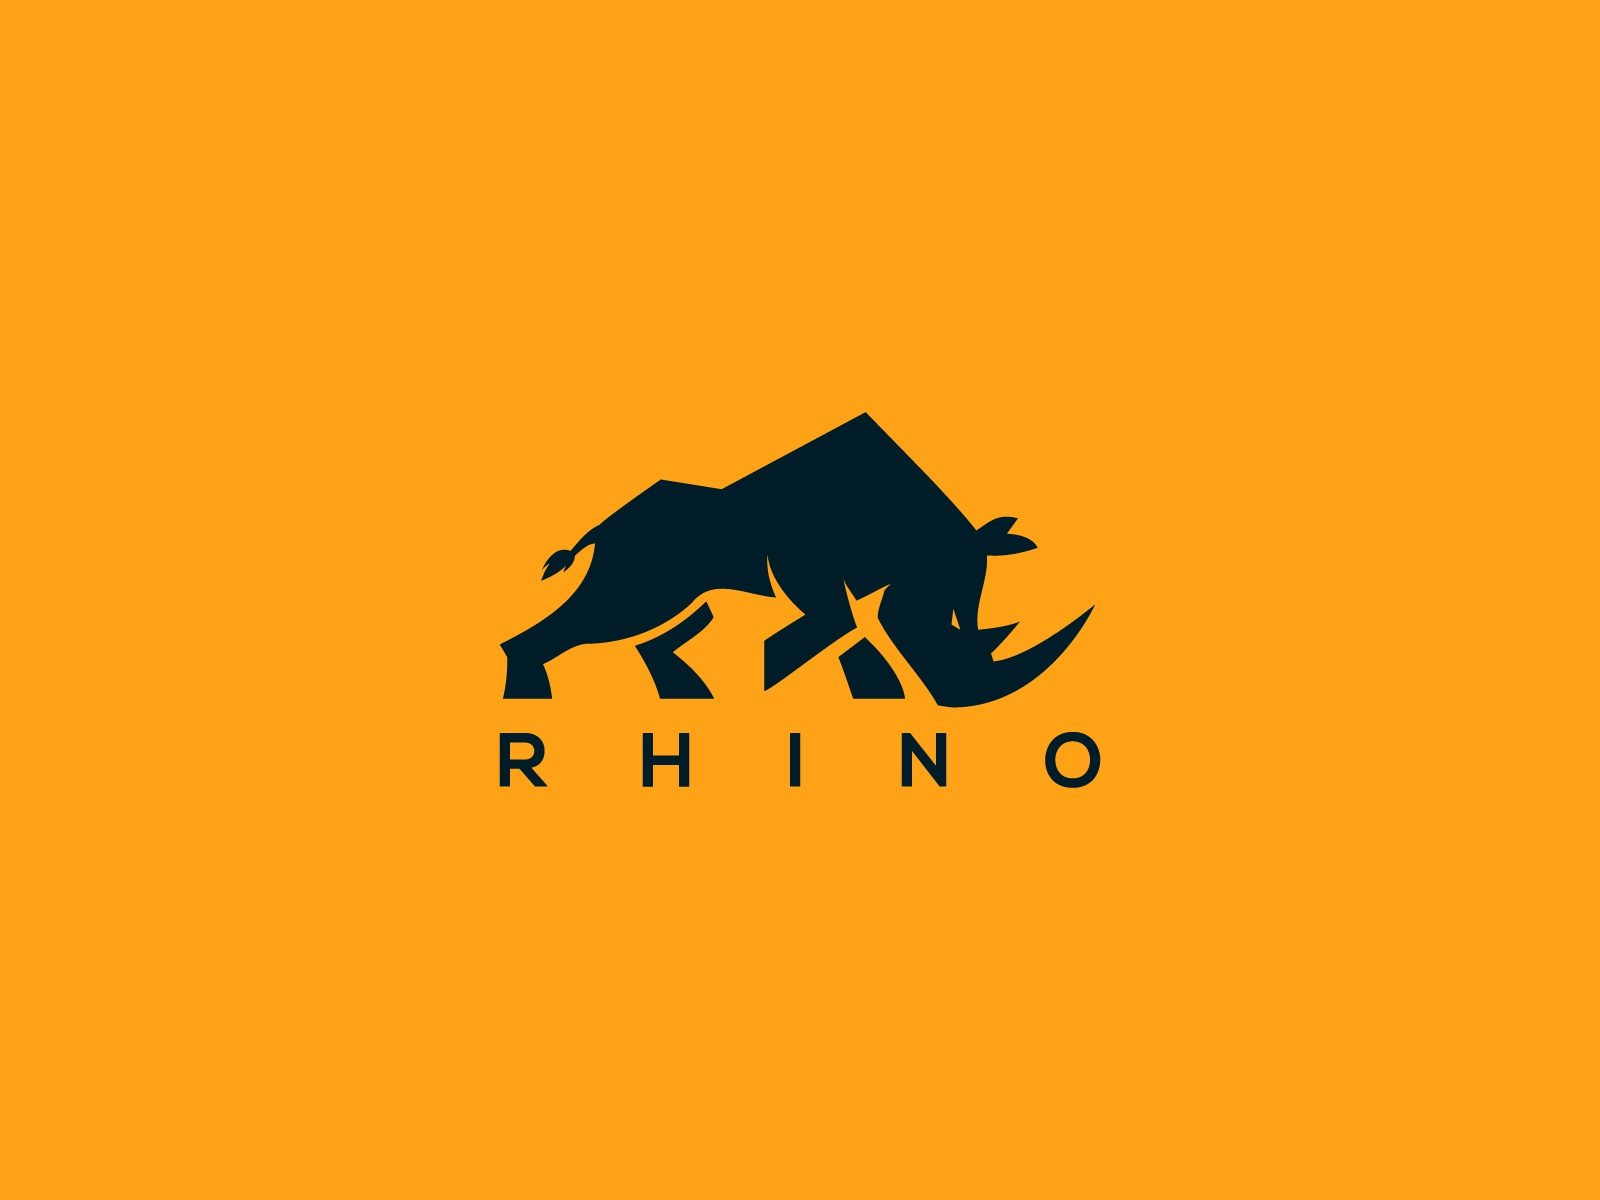 rhino-logo_4x-3069795